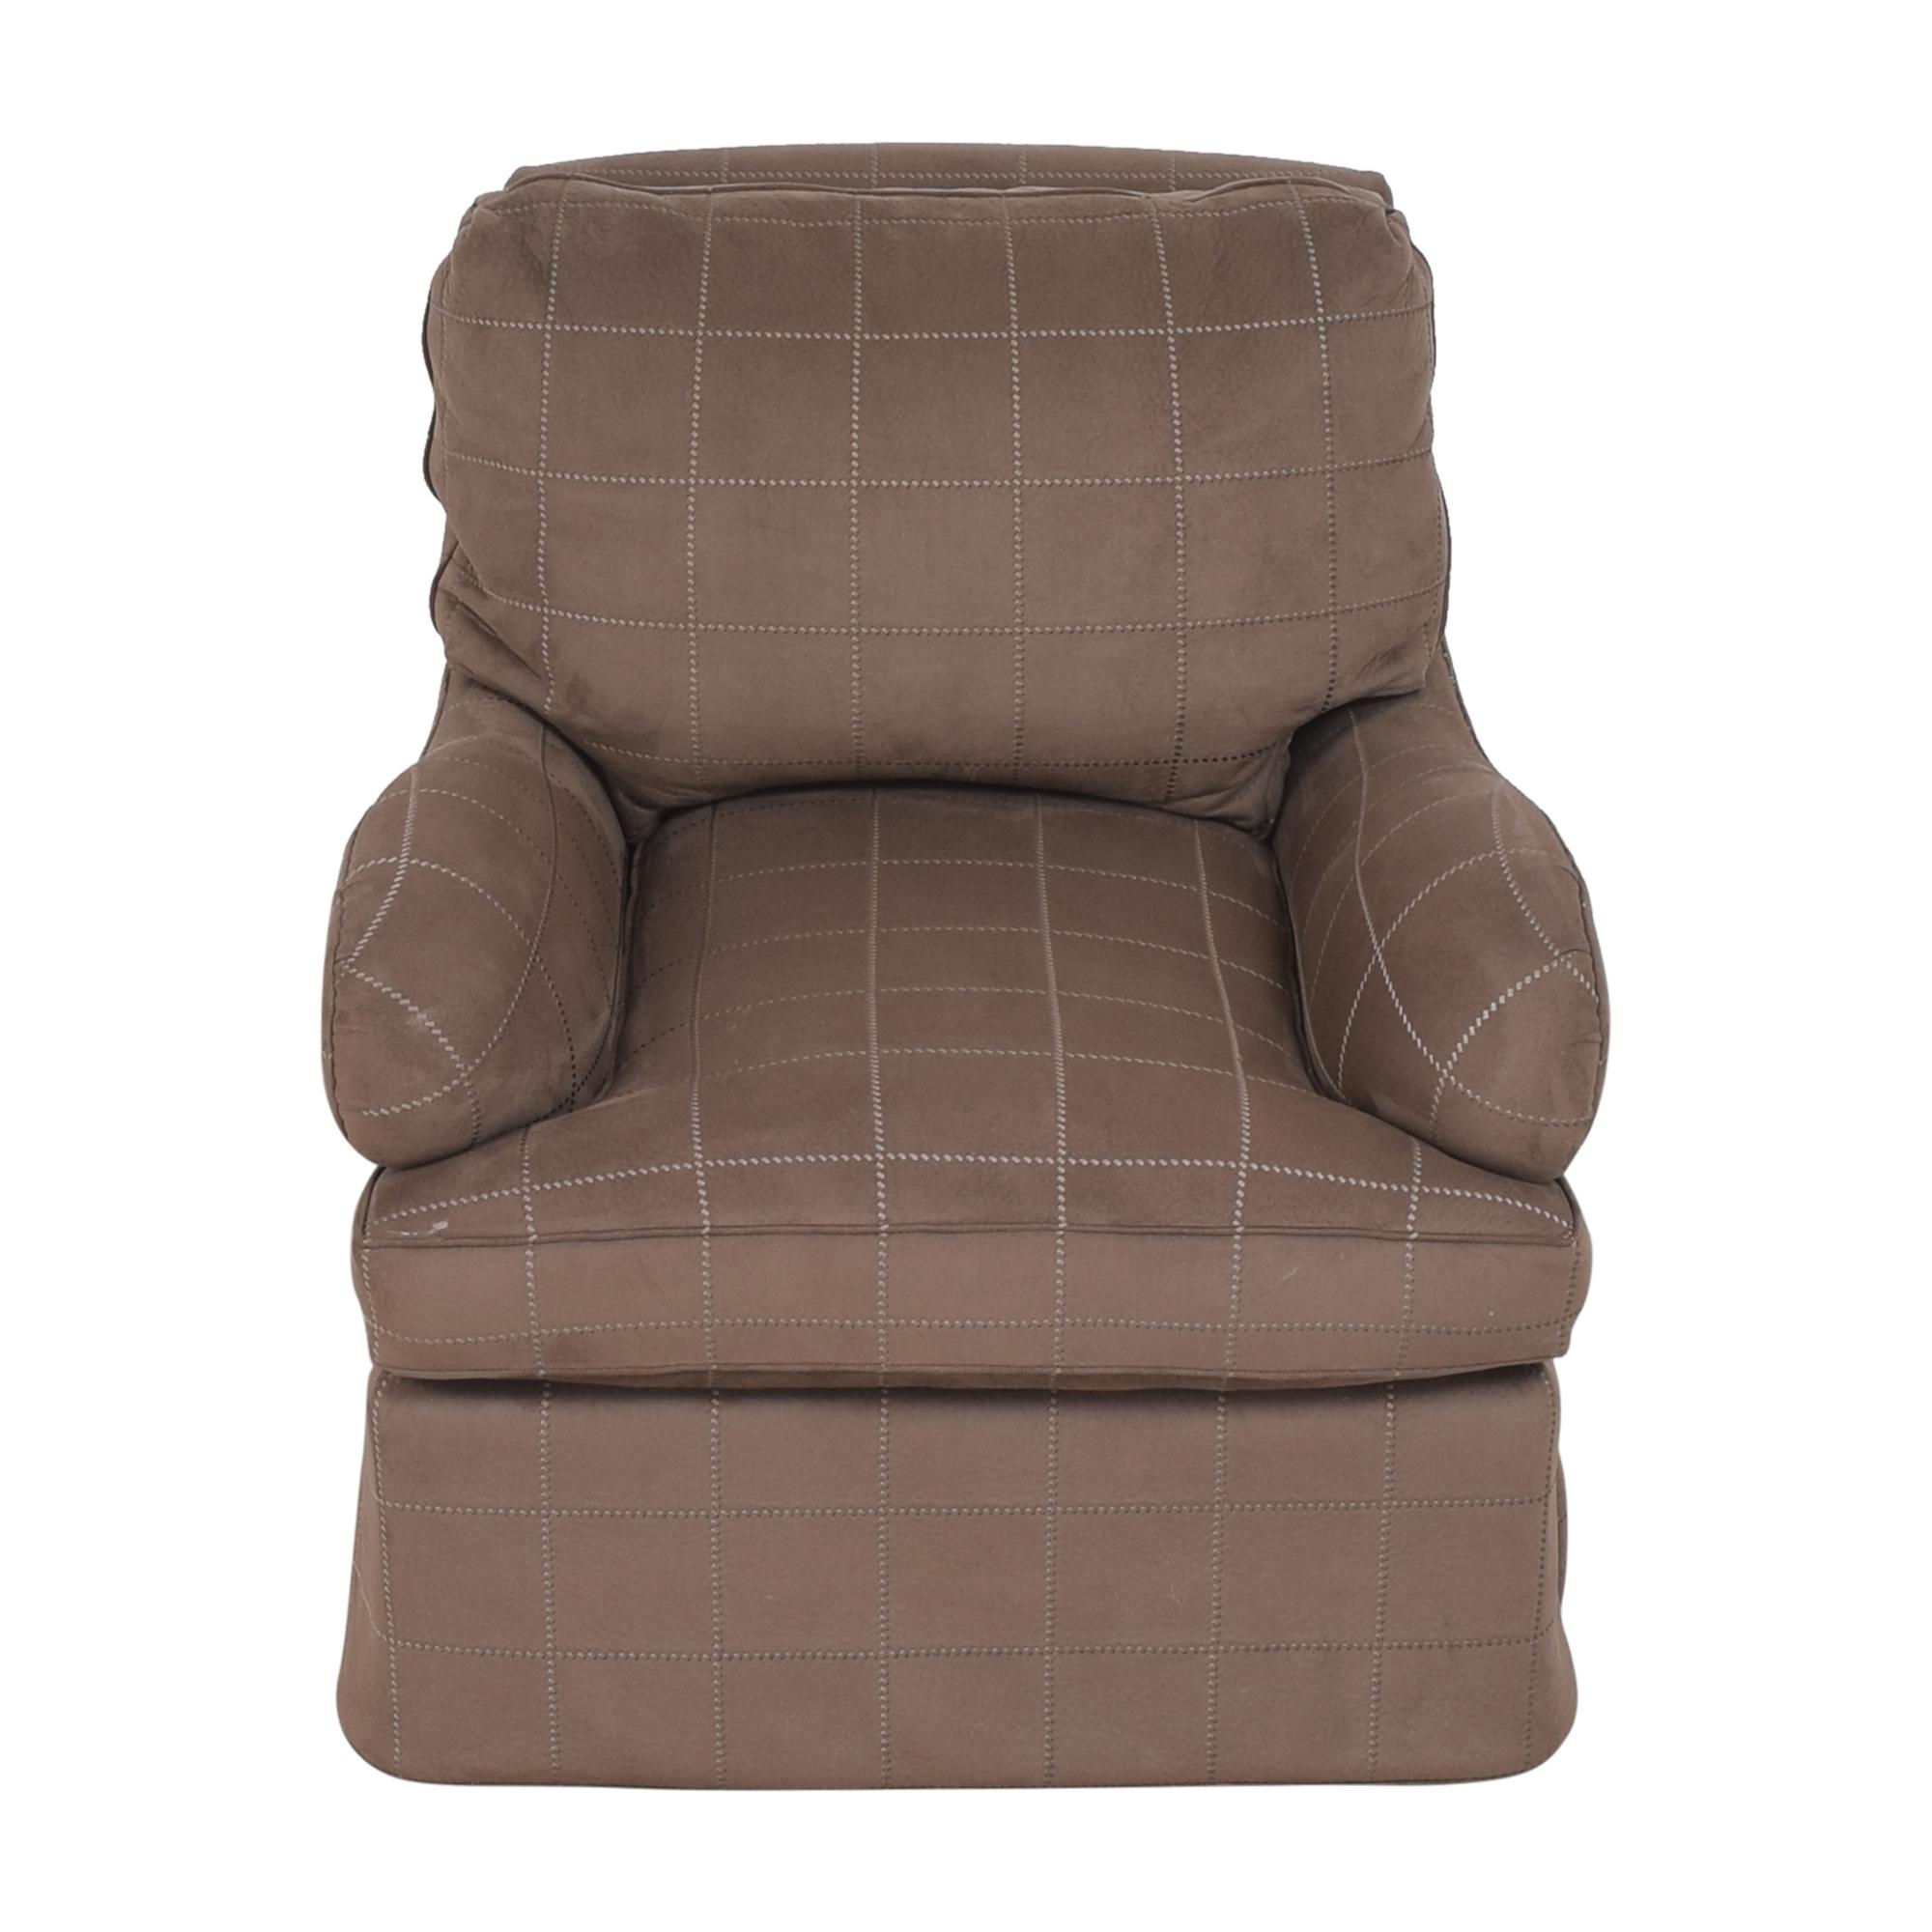 Dessin Fournir Dessin Fournir Collections Lancaster Club Chair used